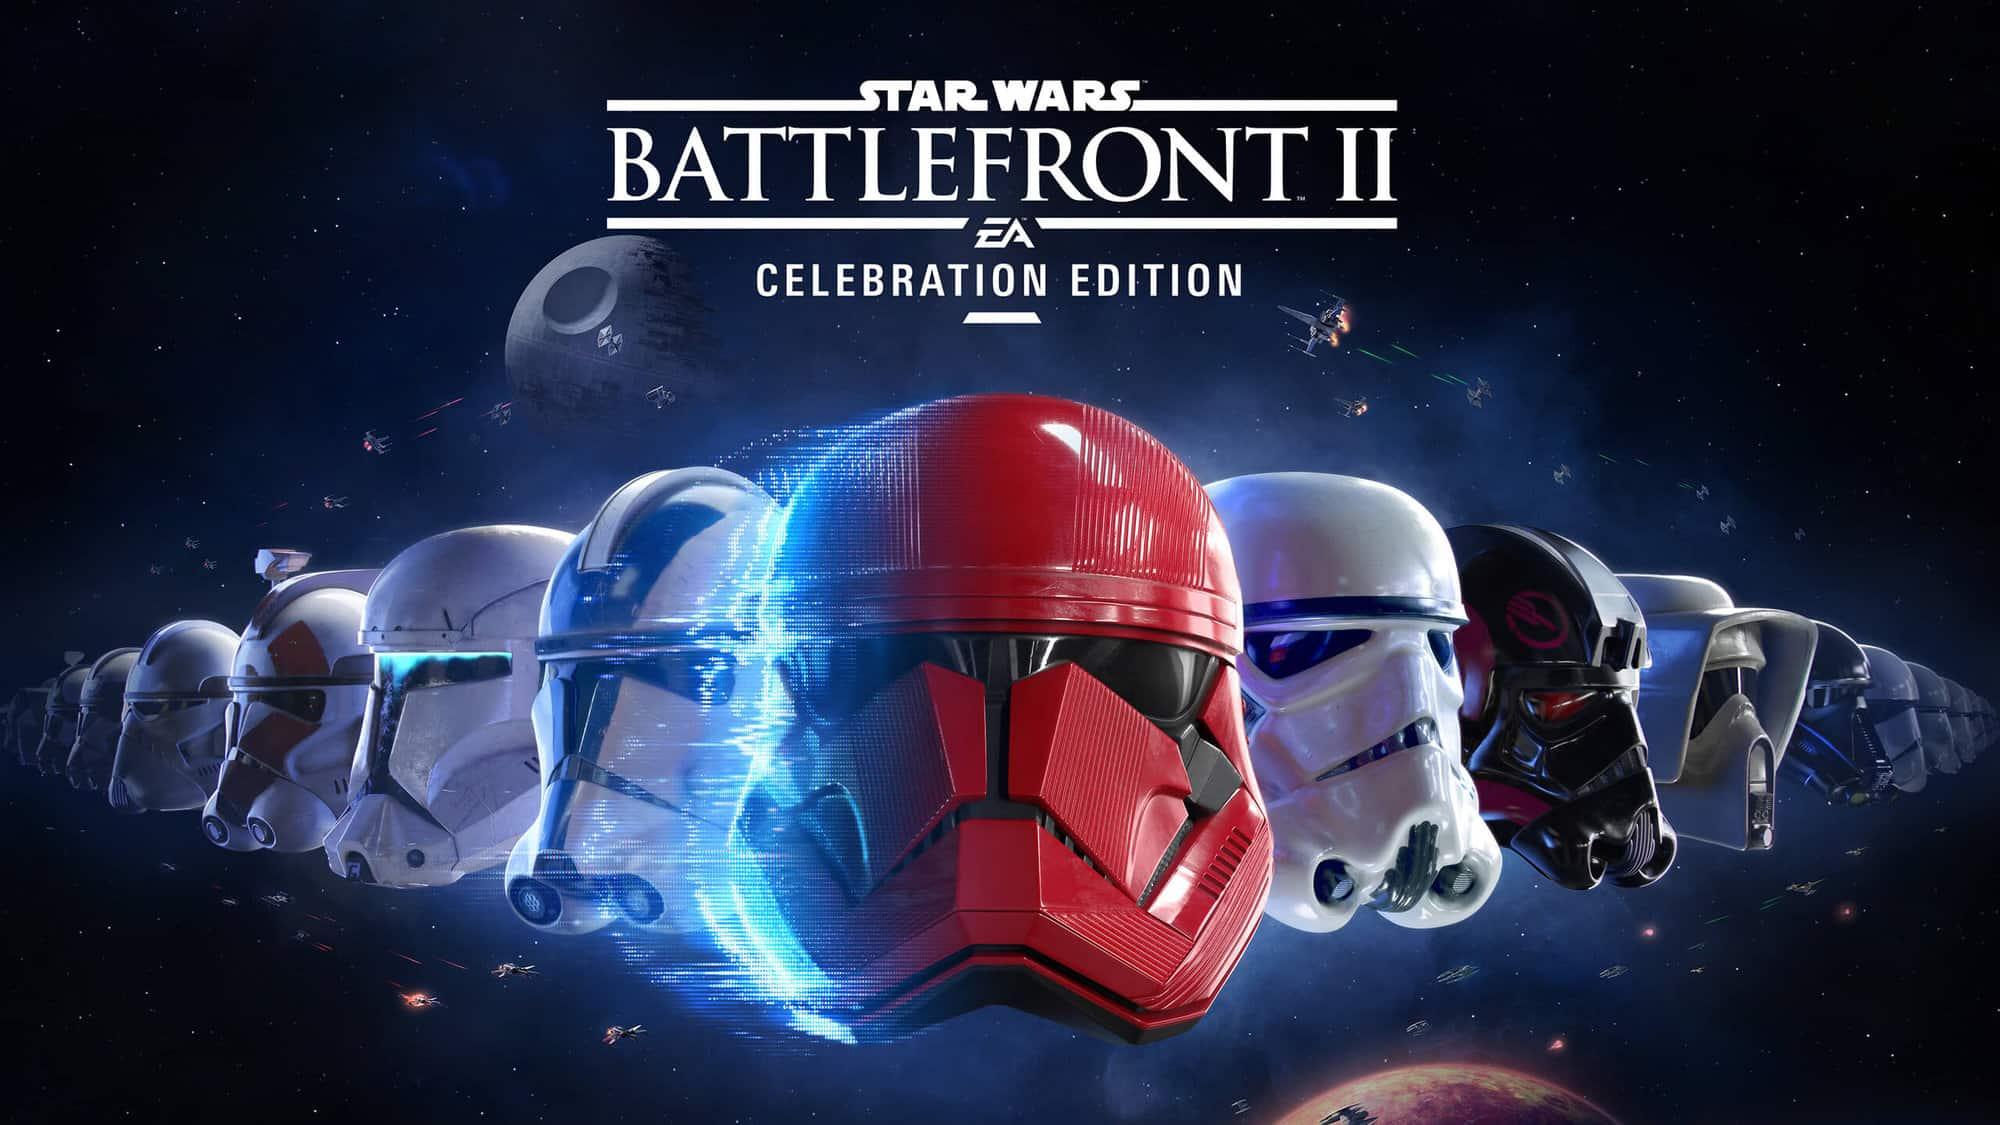 Star Wars Battlefront 2 E Proximo Jogo Gratis Da Epic Store Olhar Digital